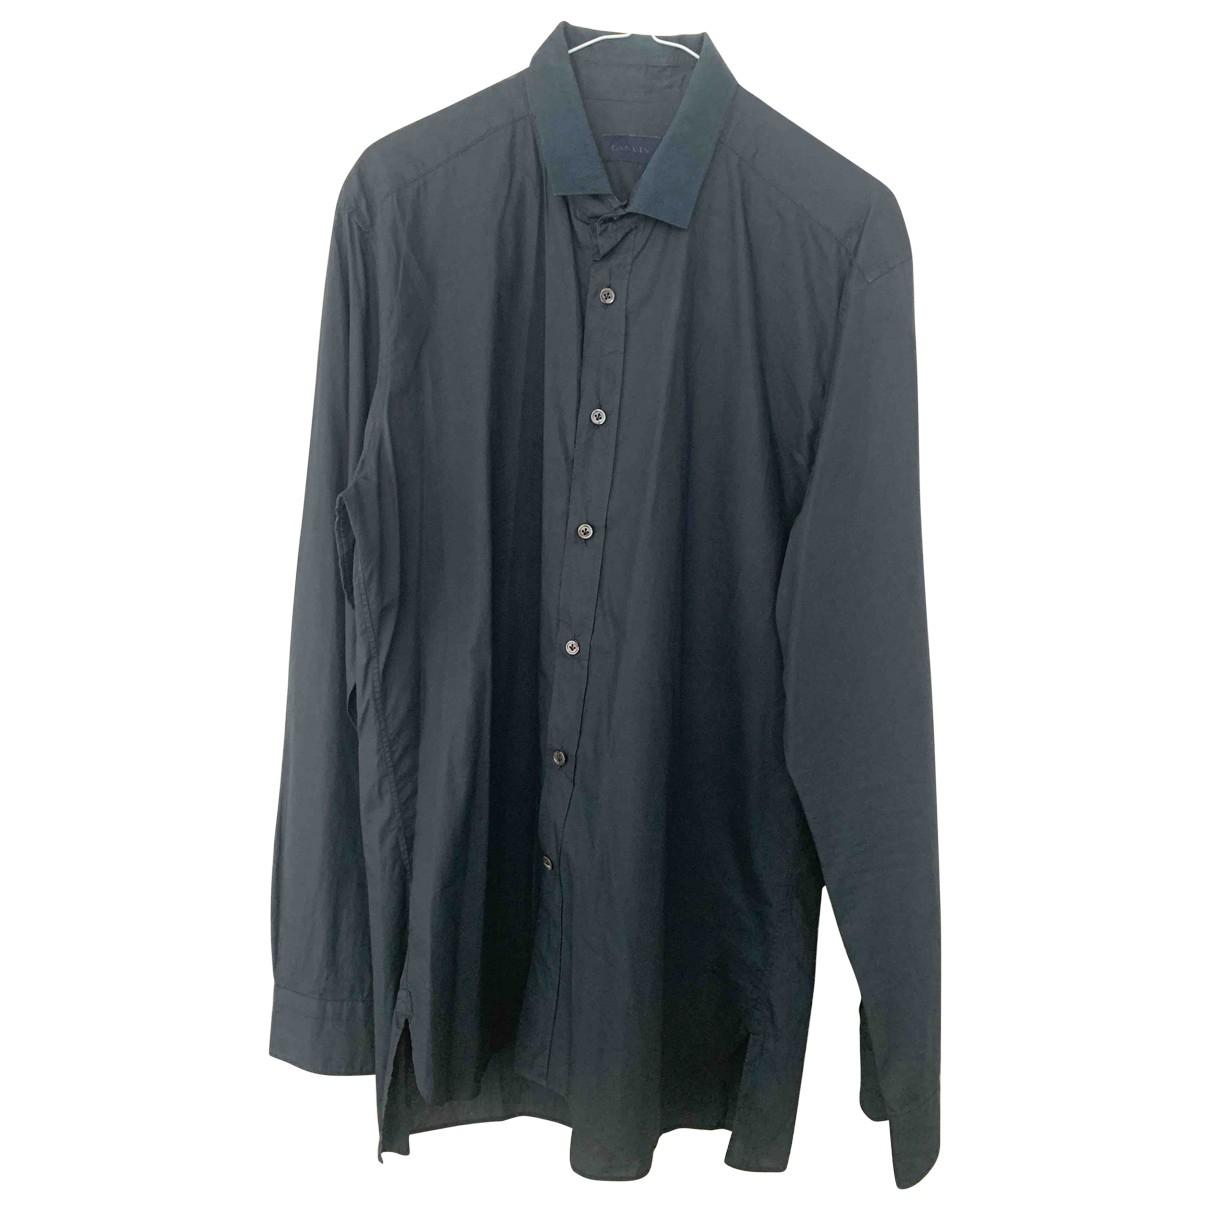 Lanvin \N Navy Cotton Shirts for Men XL International